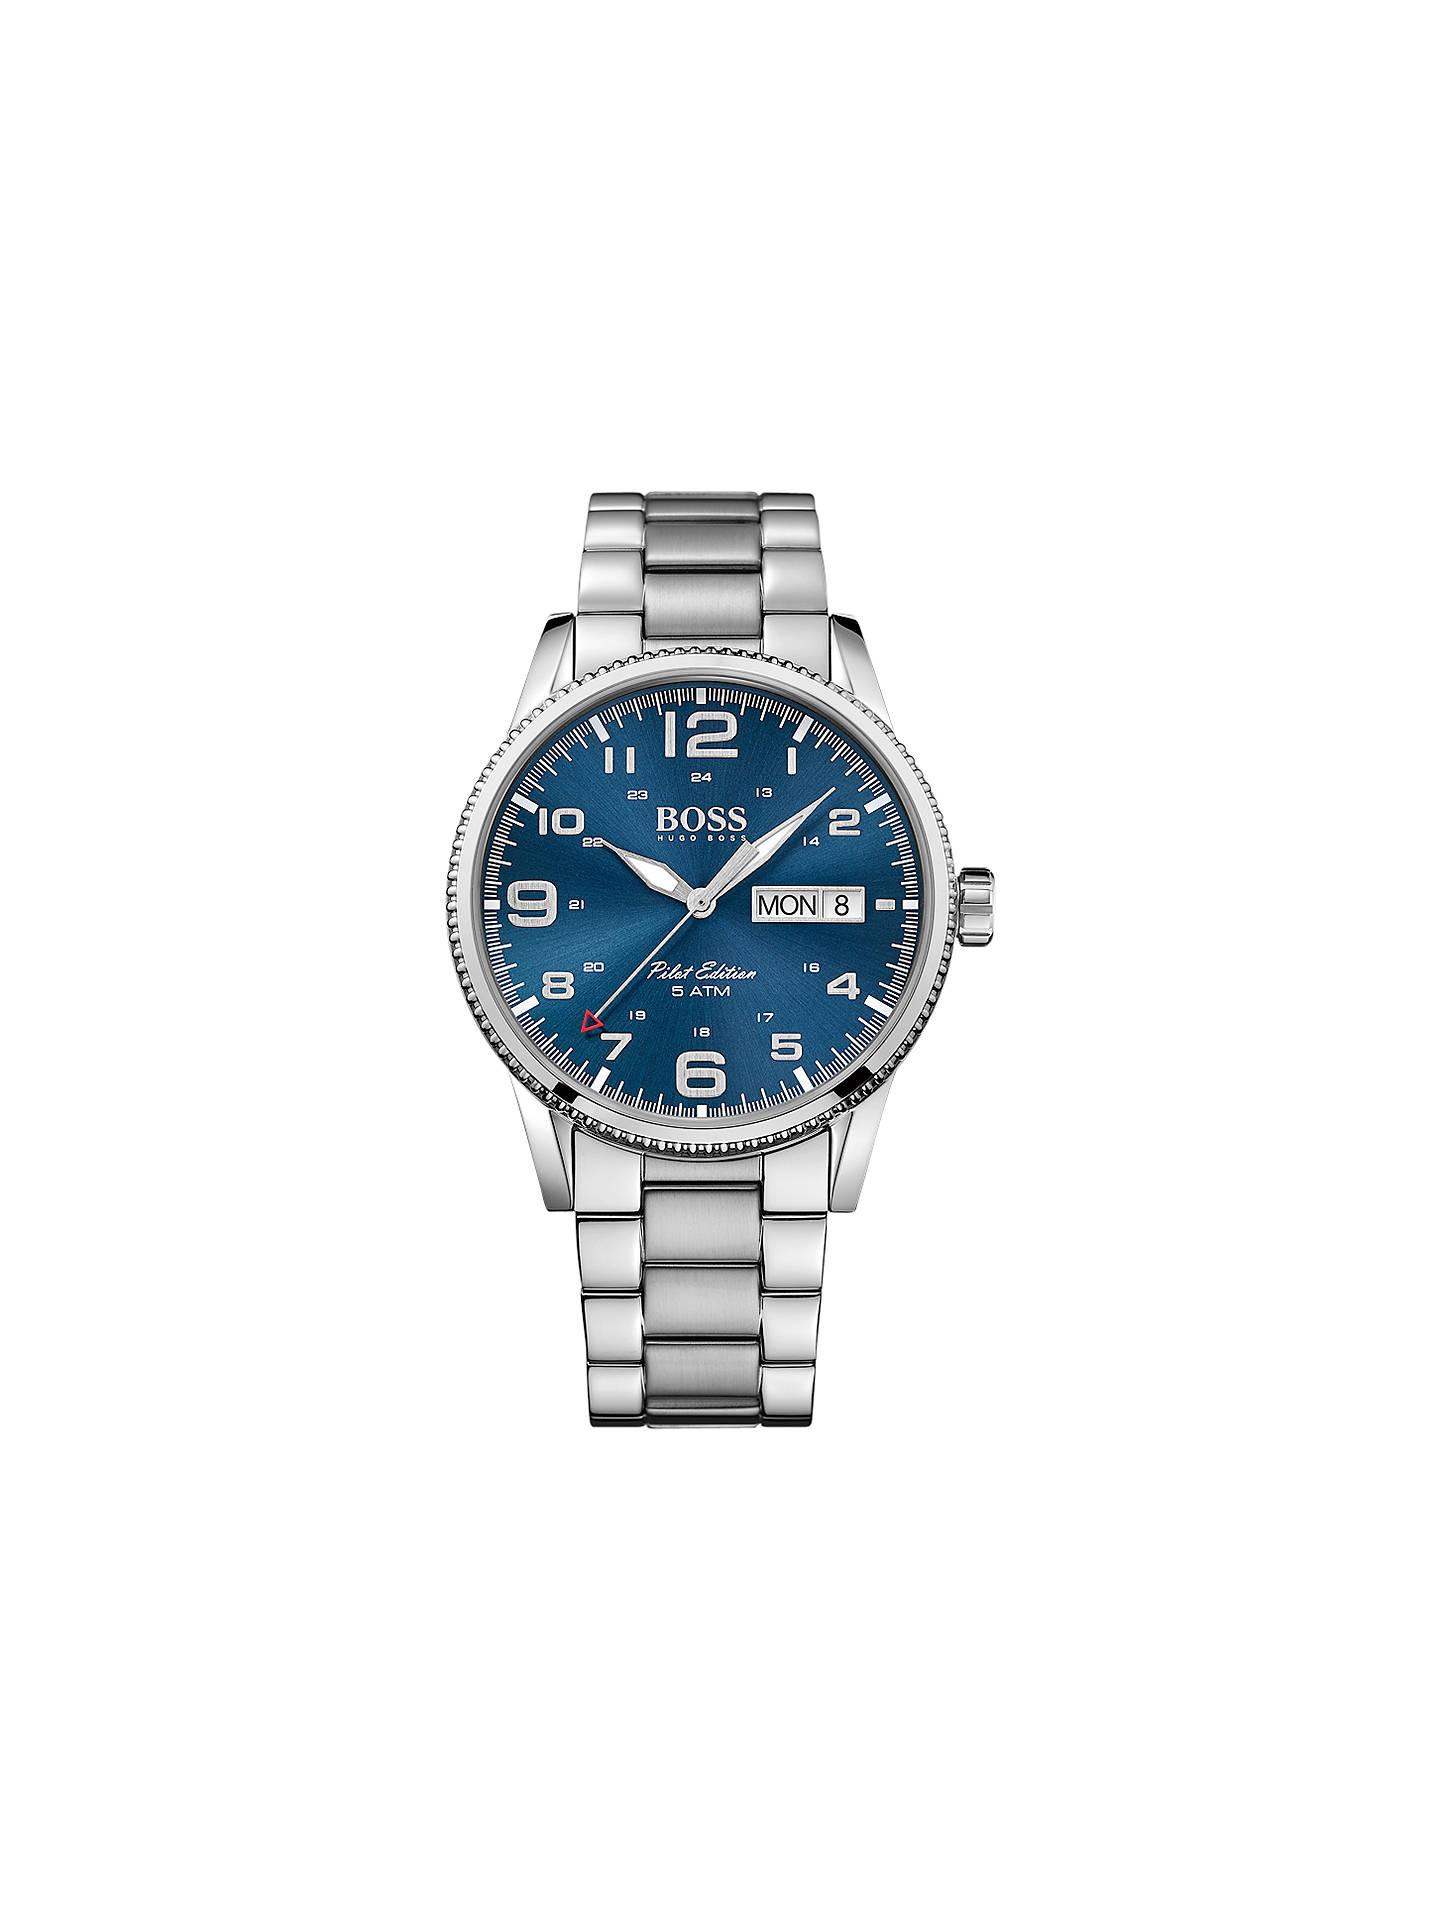 970231b08 Buy HUGO BOSS 1513329 Men's Pilot Vintage Day Date Bracelet Strap Watch,  Silver/Blue